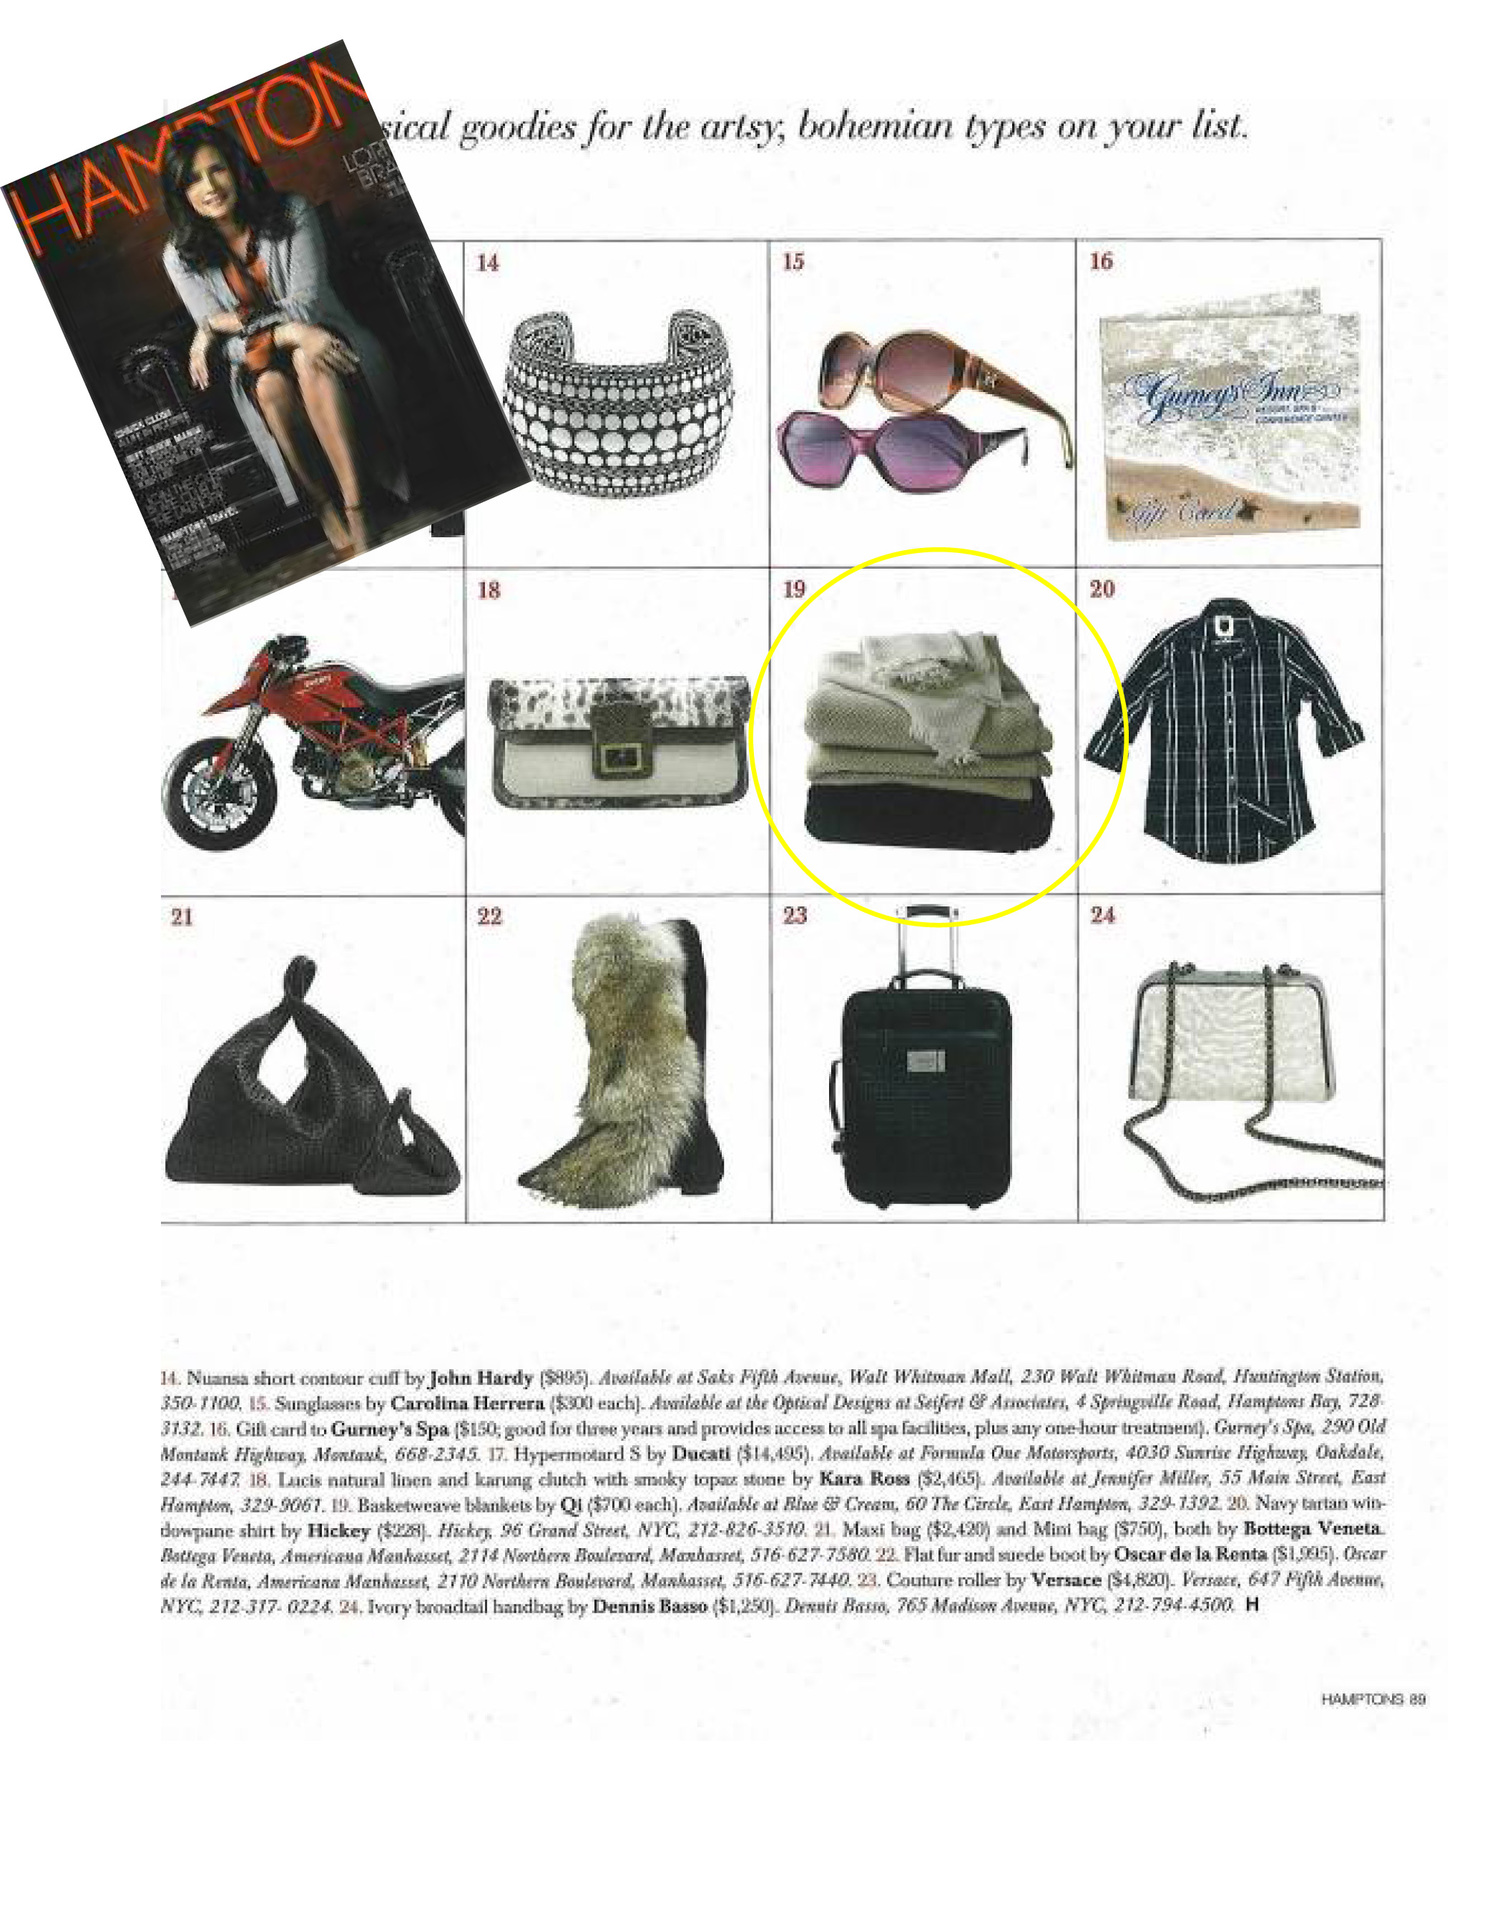 7.Qi Cashmere Blankets in Hamptons Magazine.jpg